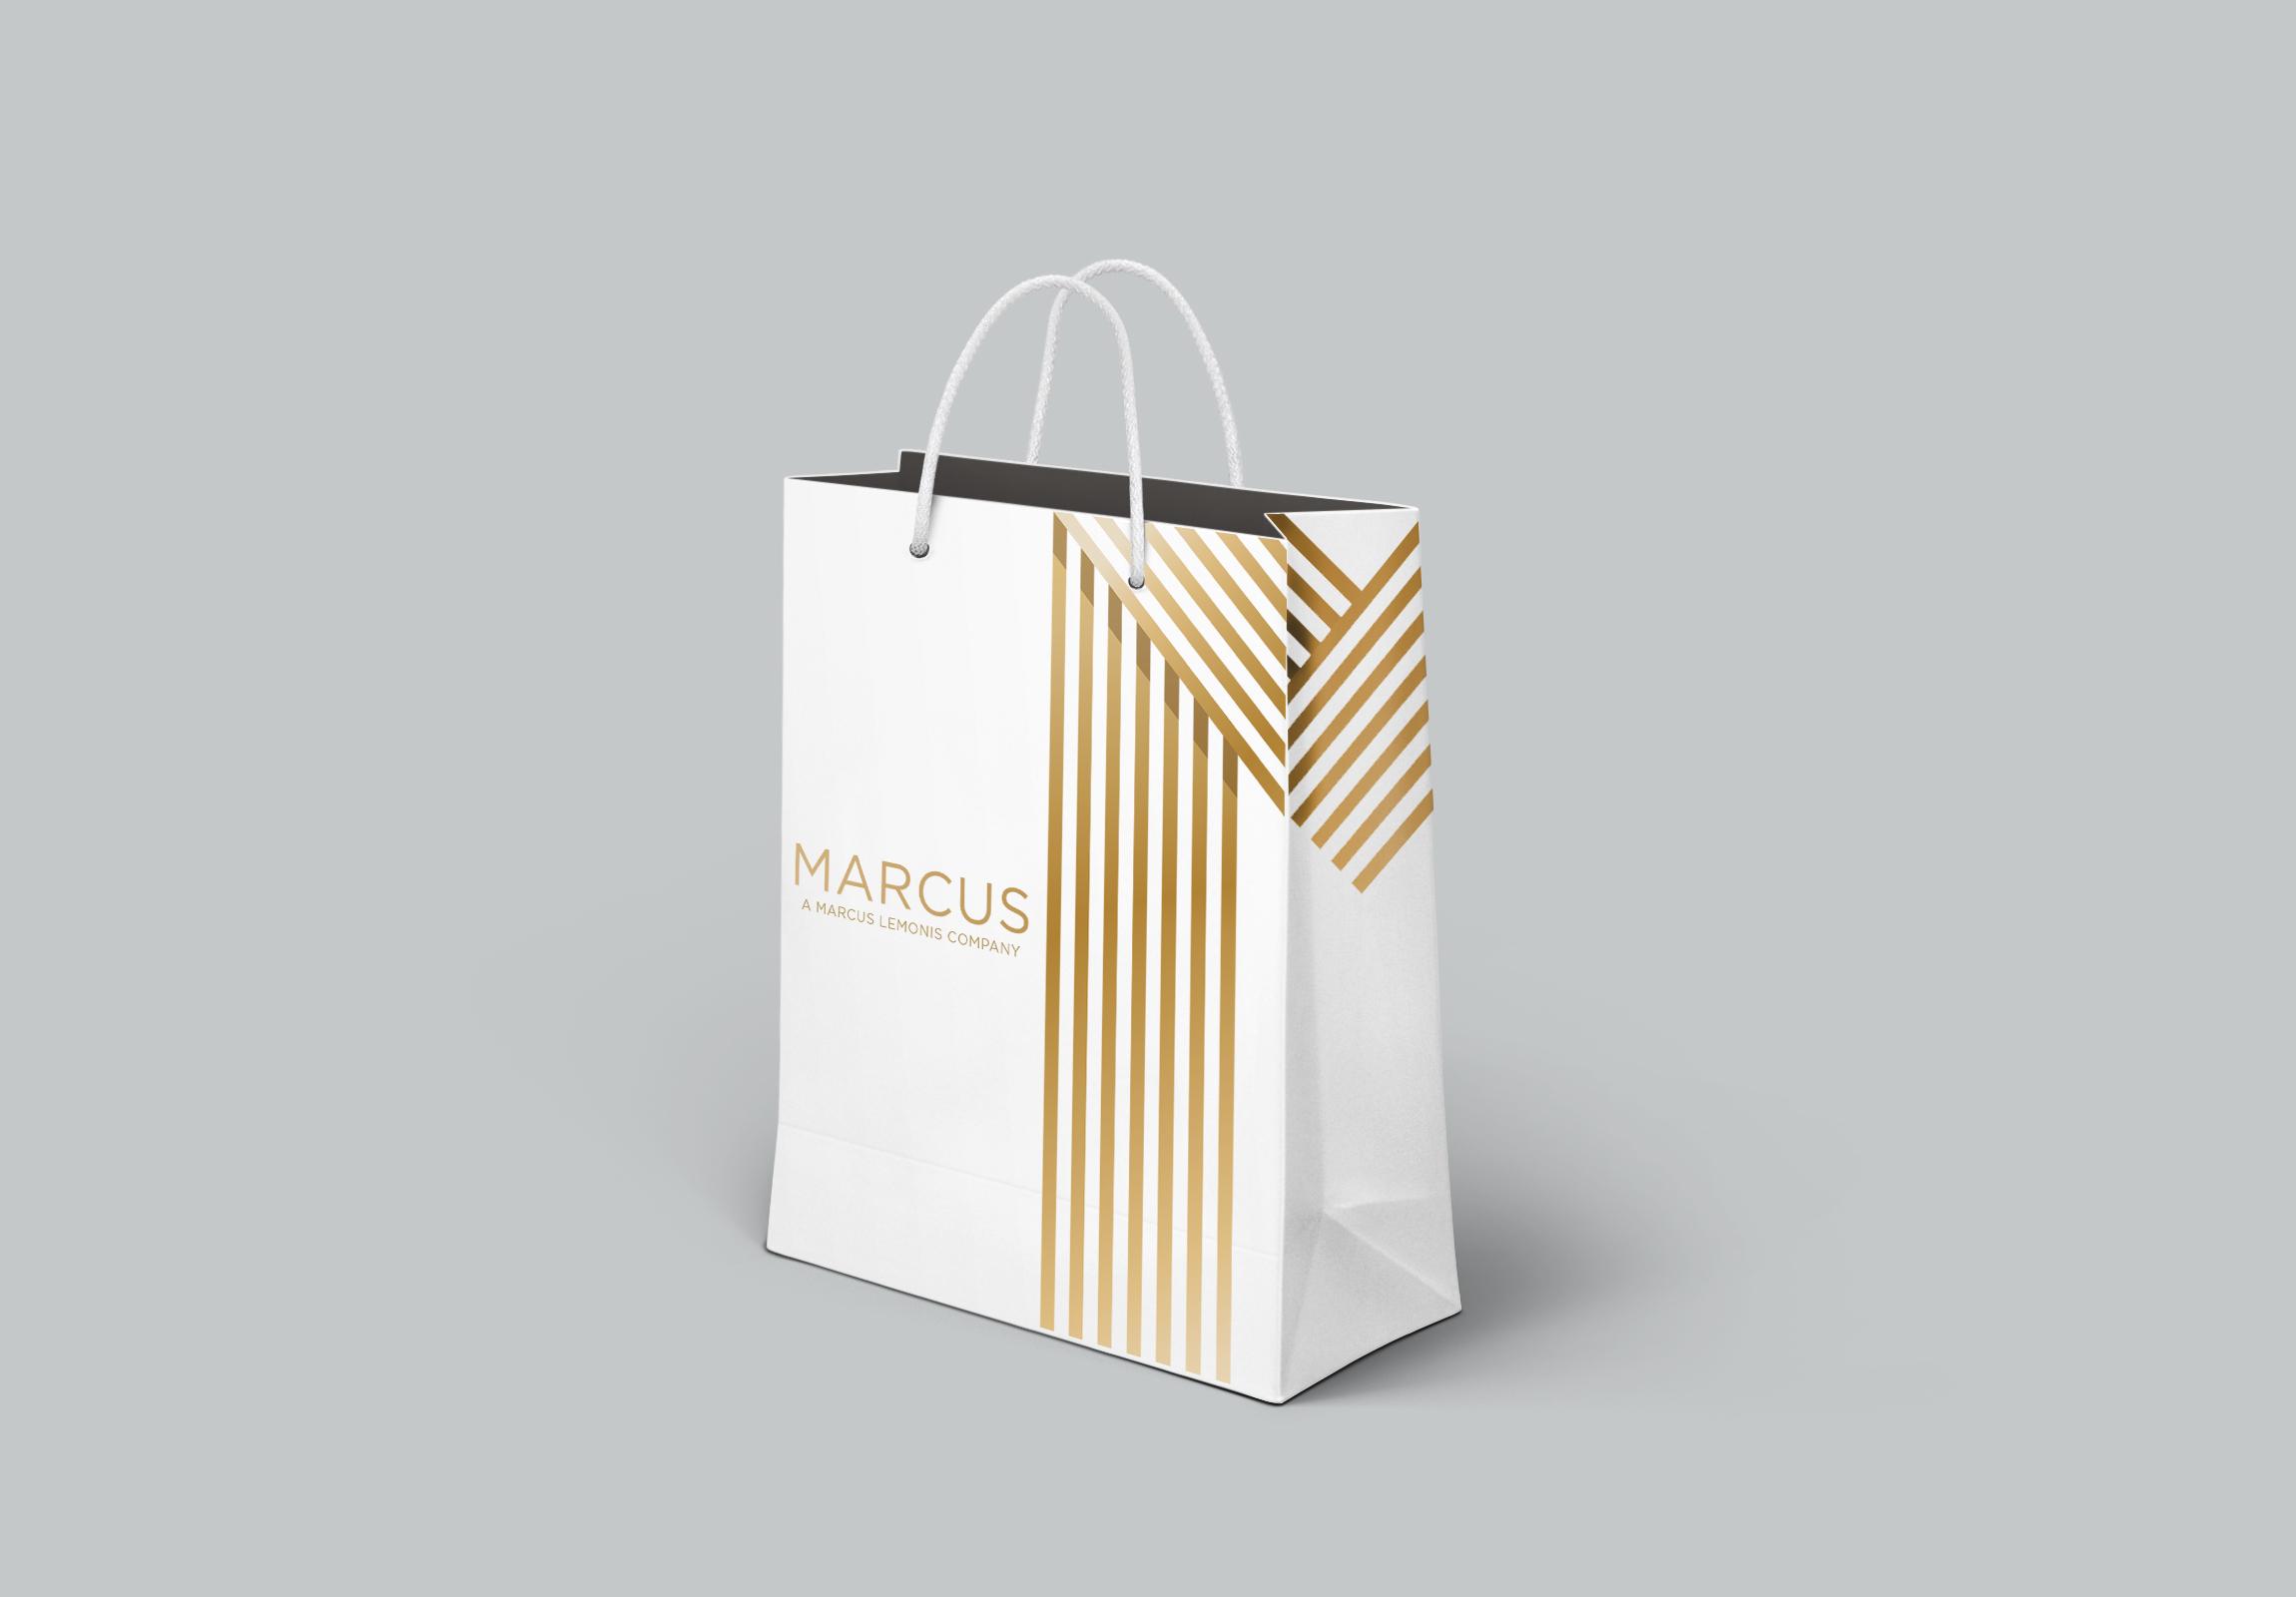 Marcus_Shopping Bag-Small XSmall_Side.jpg